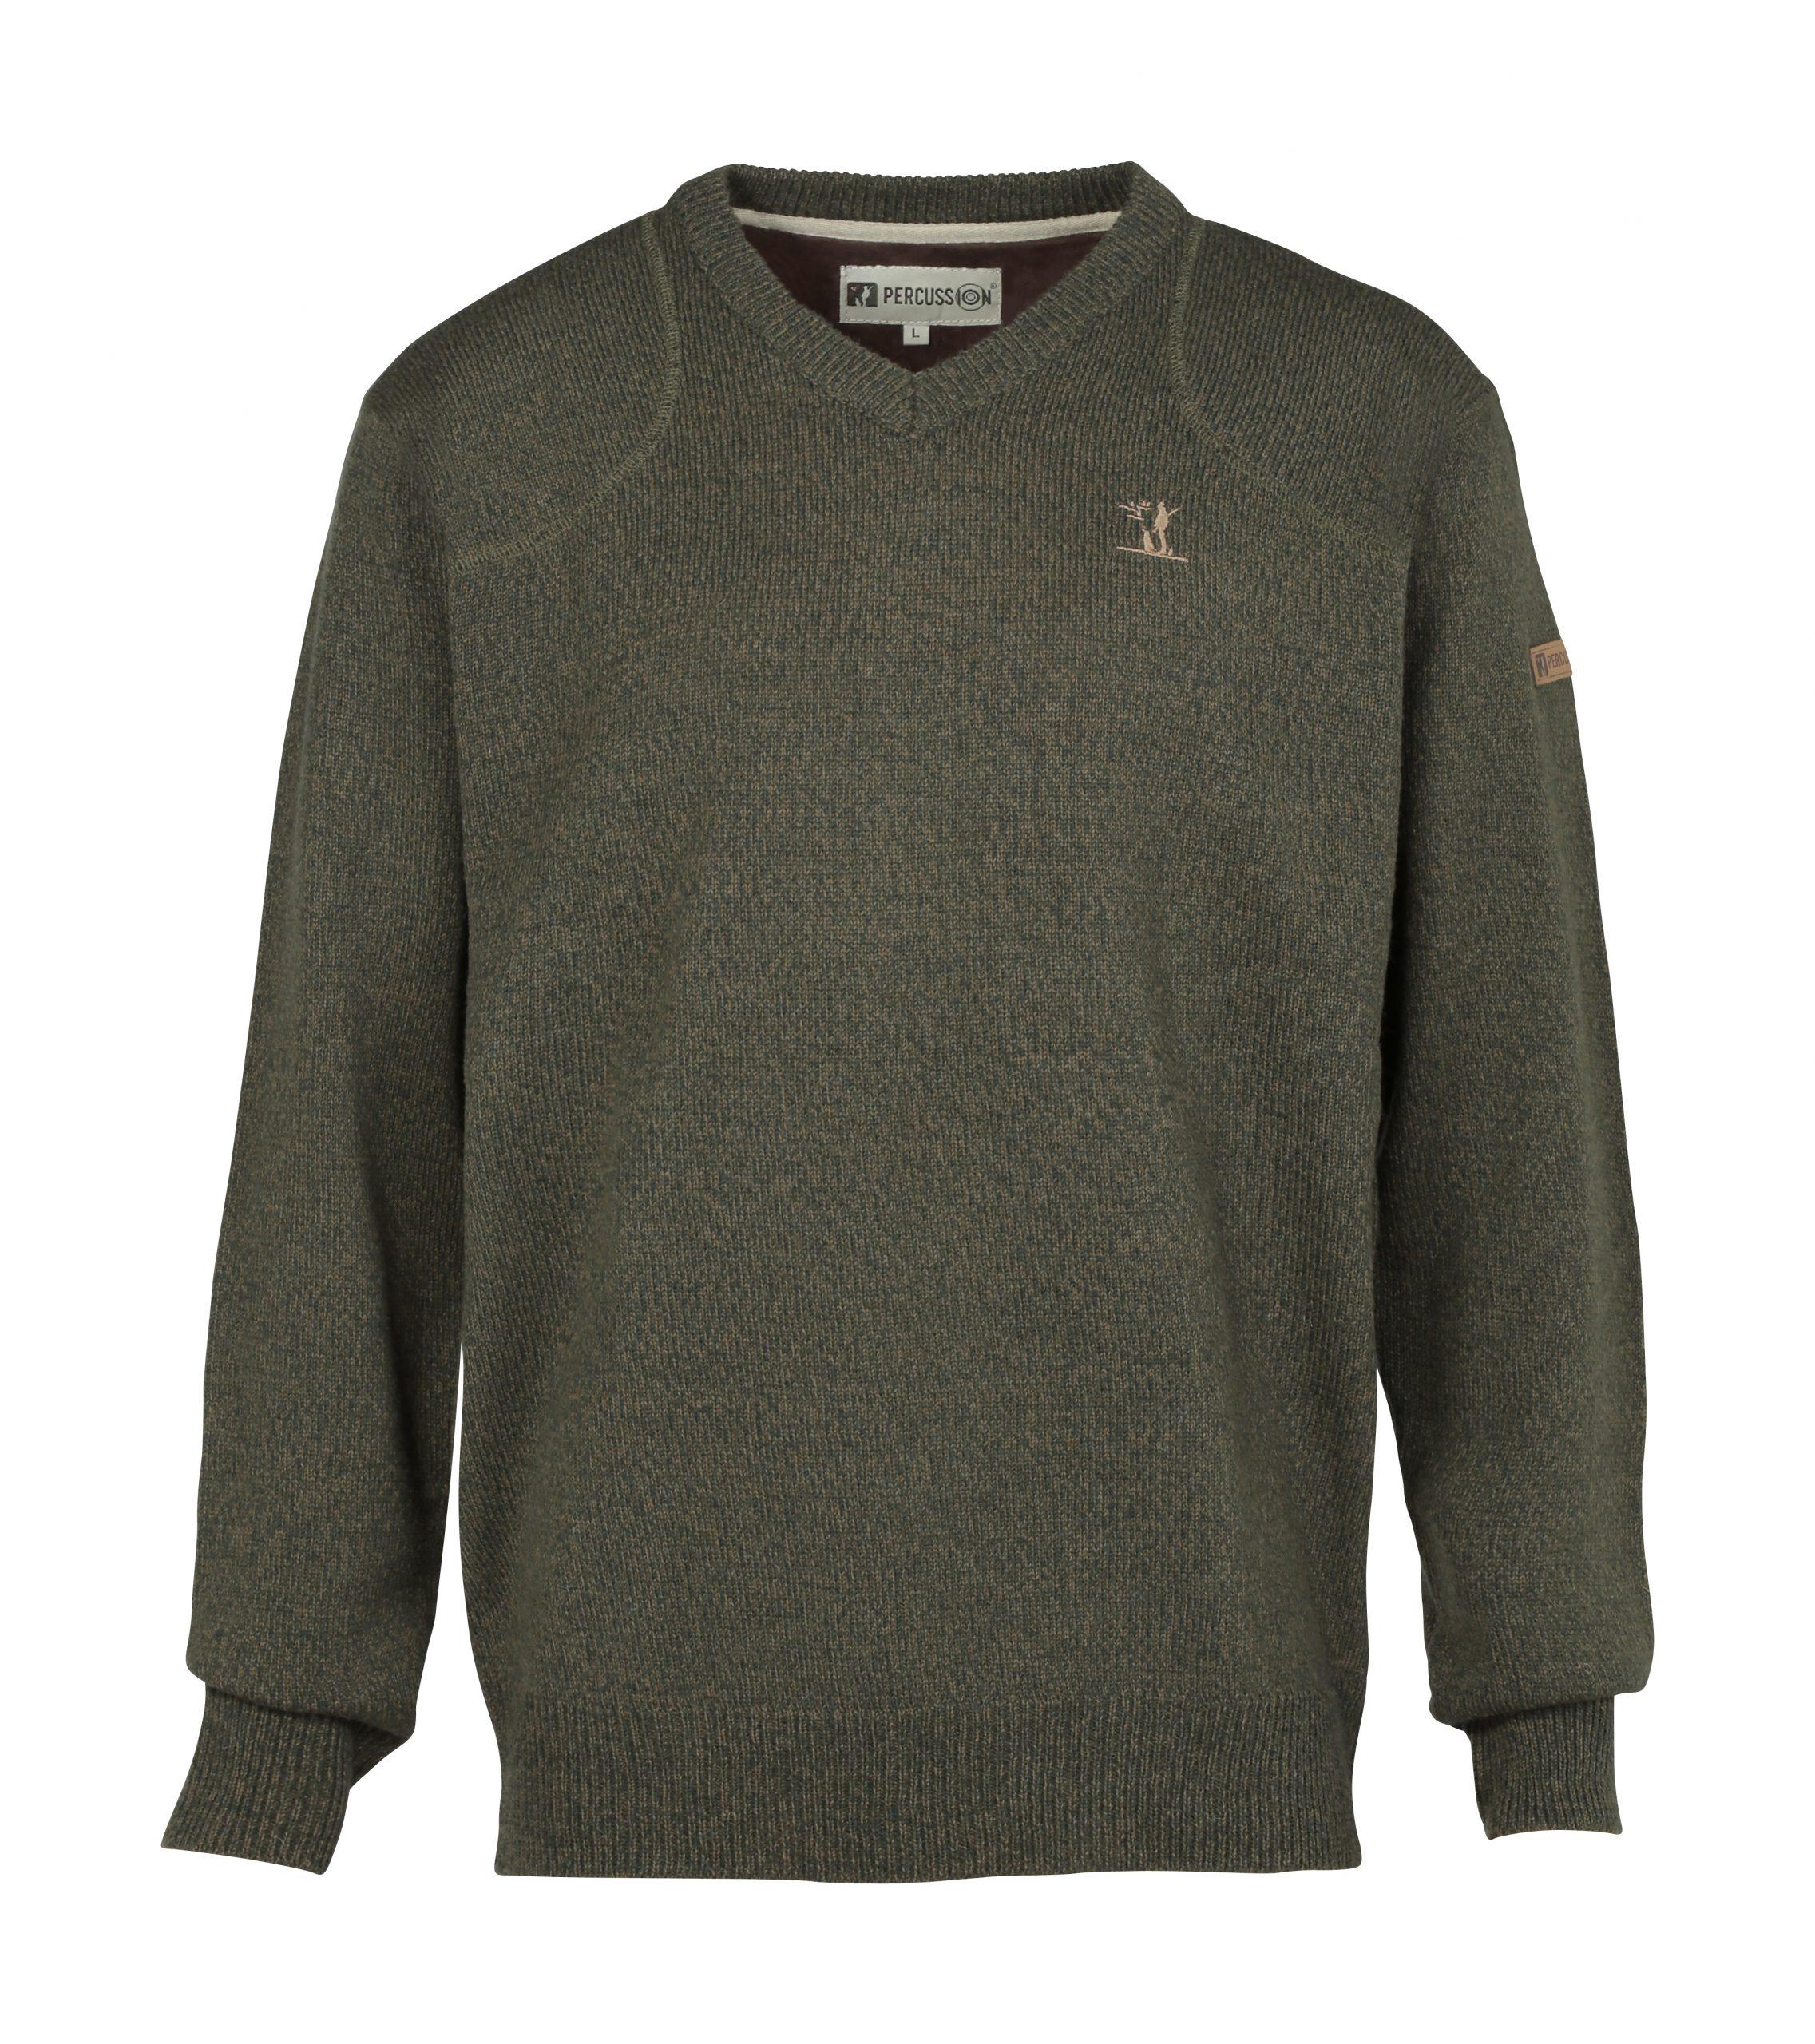 Percussion V-Neck Sweatshirt Olive